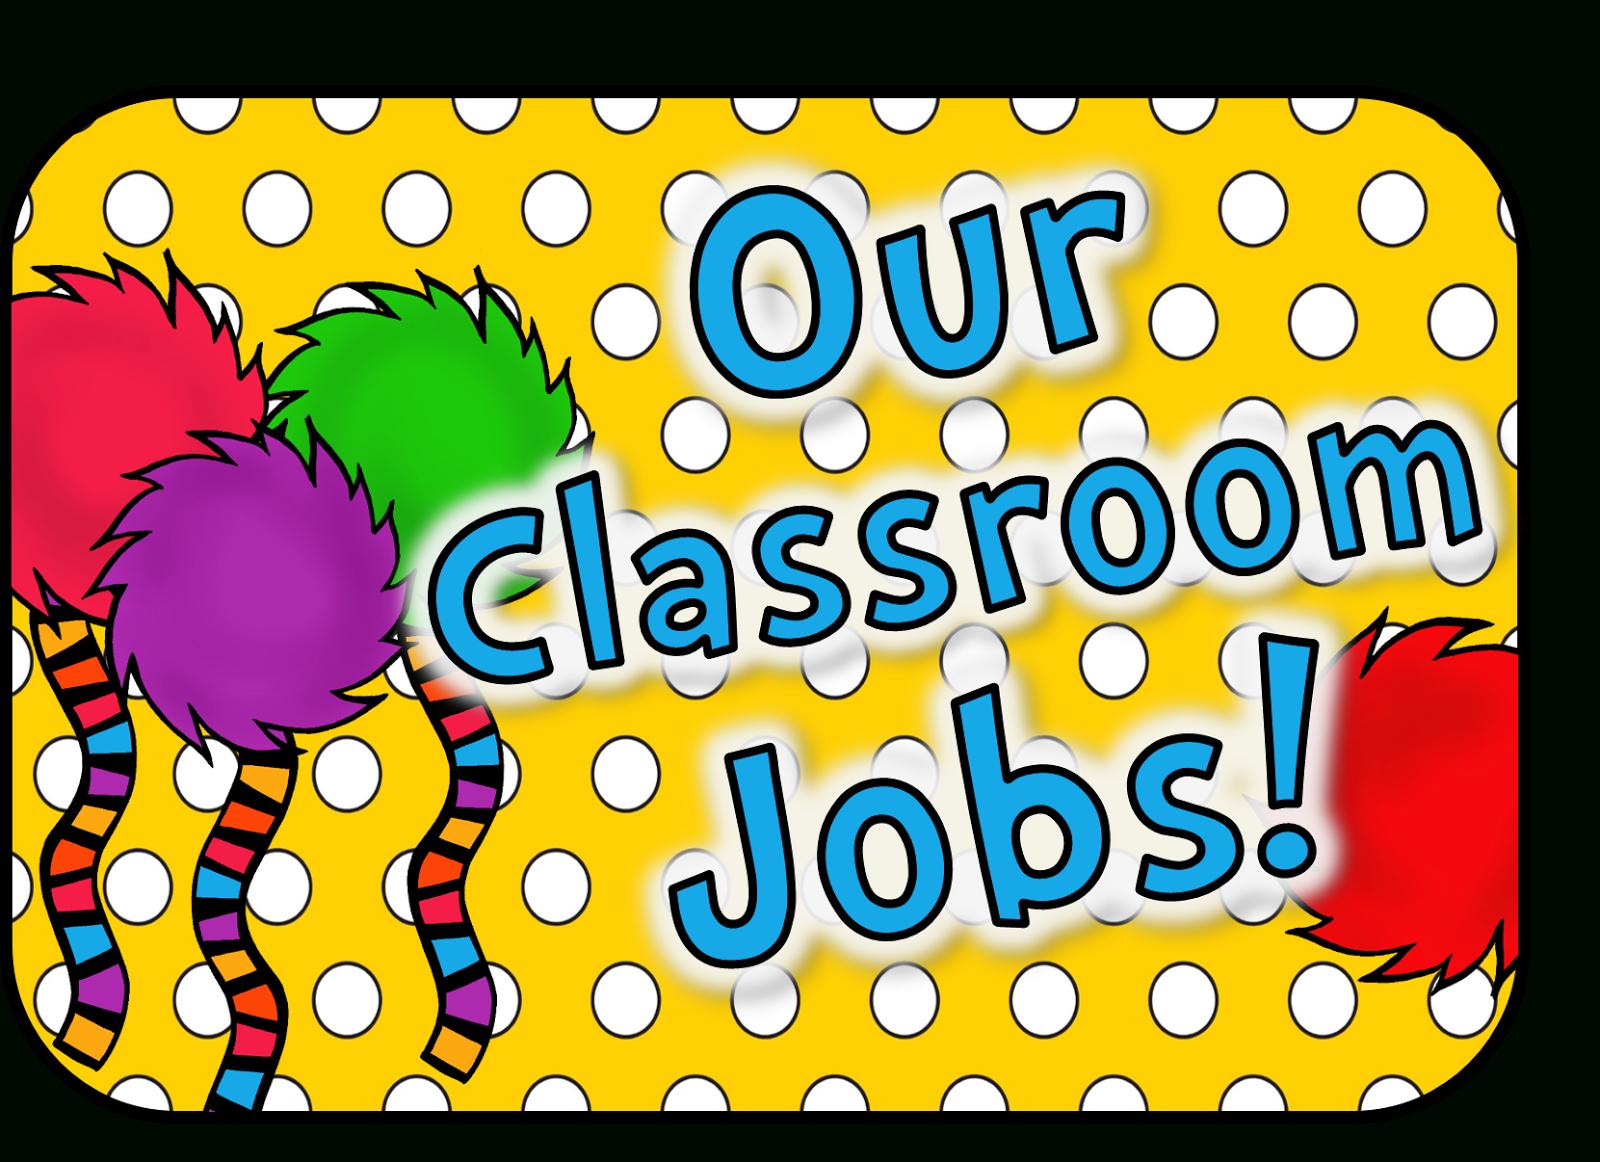 Classroom Job Clipart | Free Download Best Classroom Job Clipart On - Free Printable Classroom Helper Signs